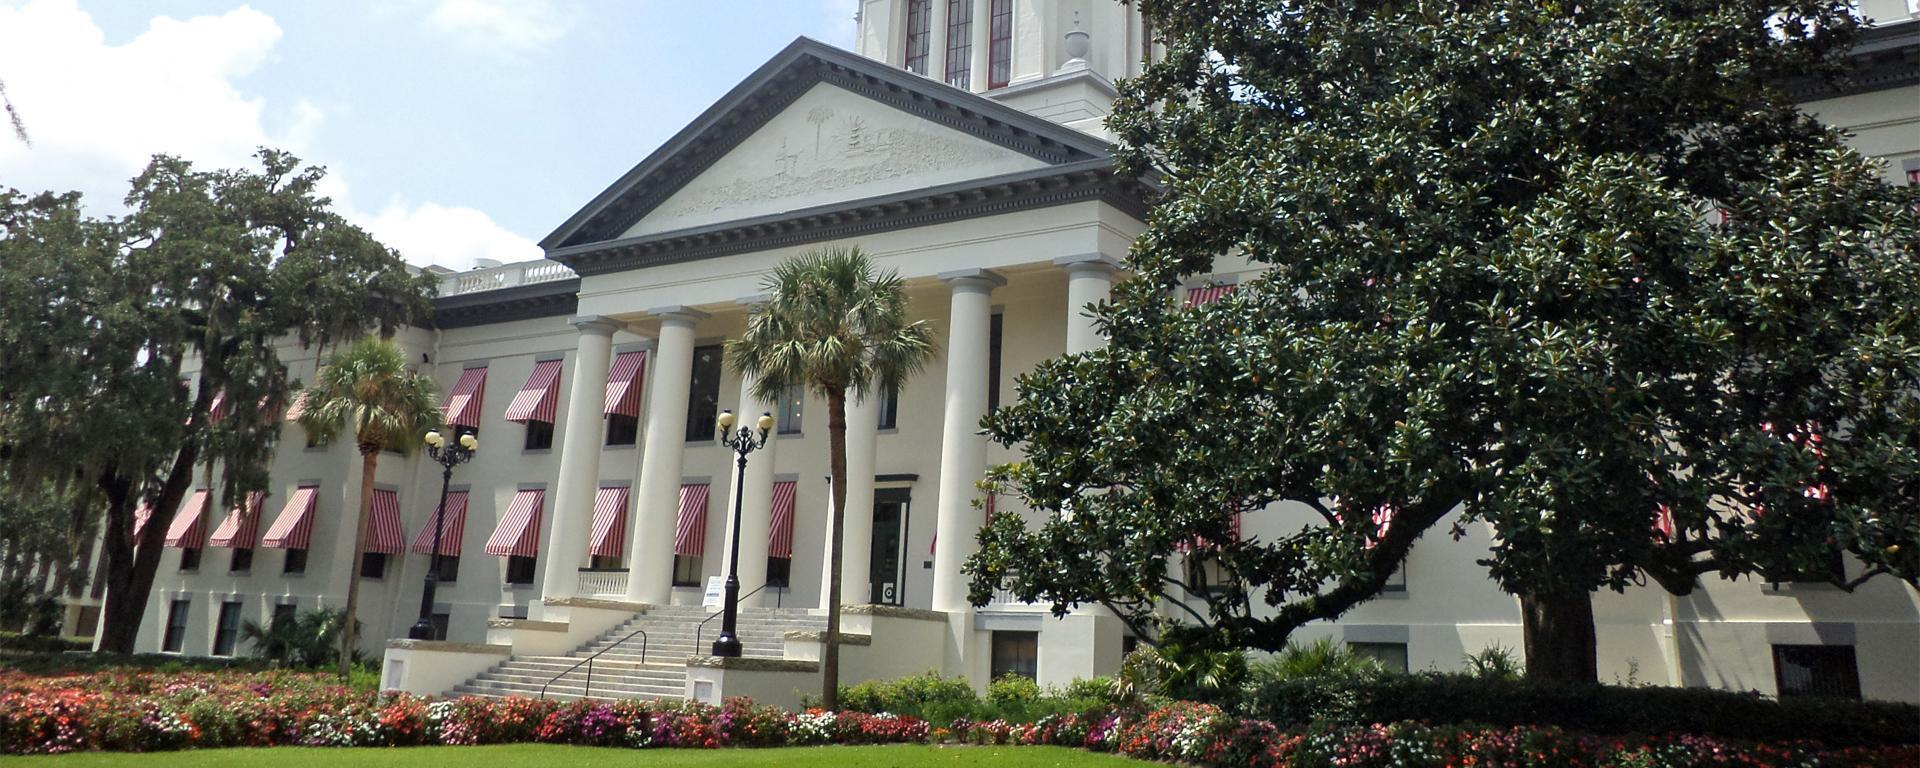 Florida's Historic Capitol, Tallahassee / Michael Rivera